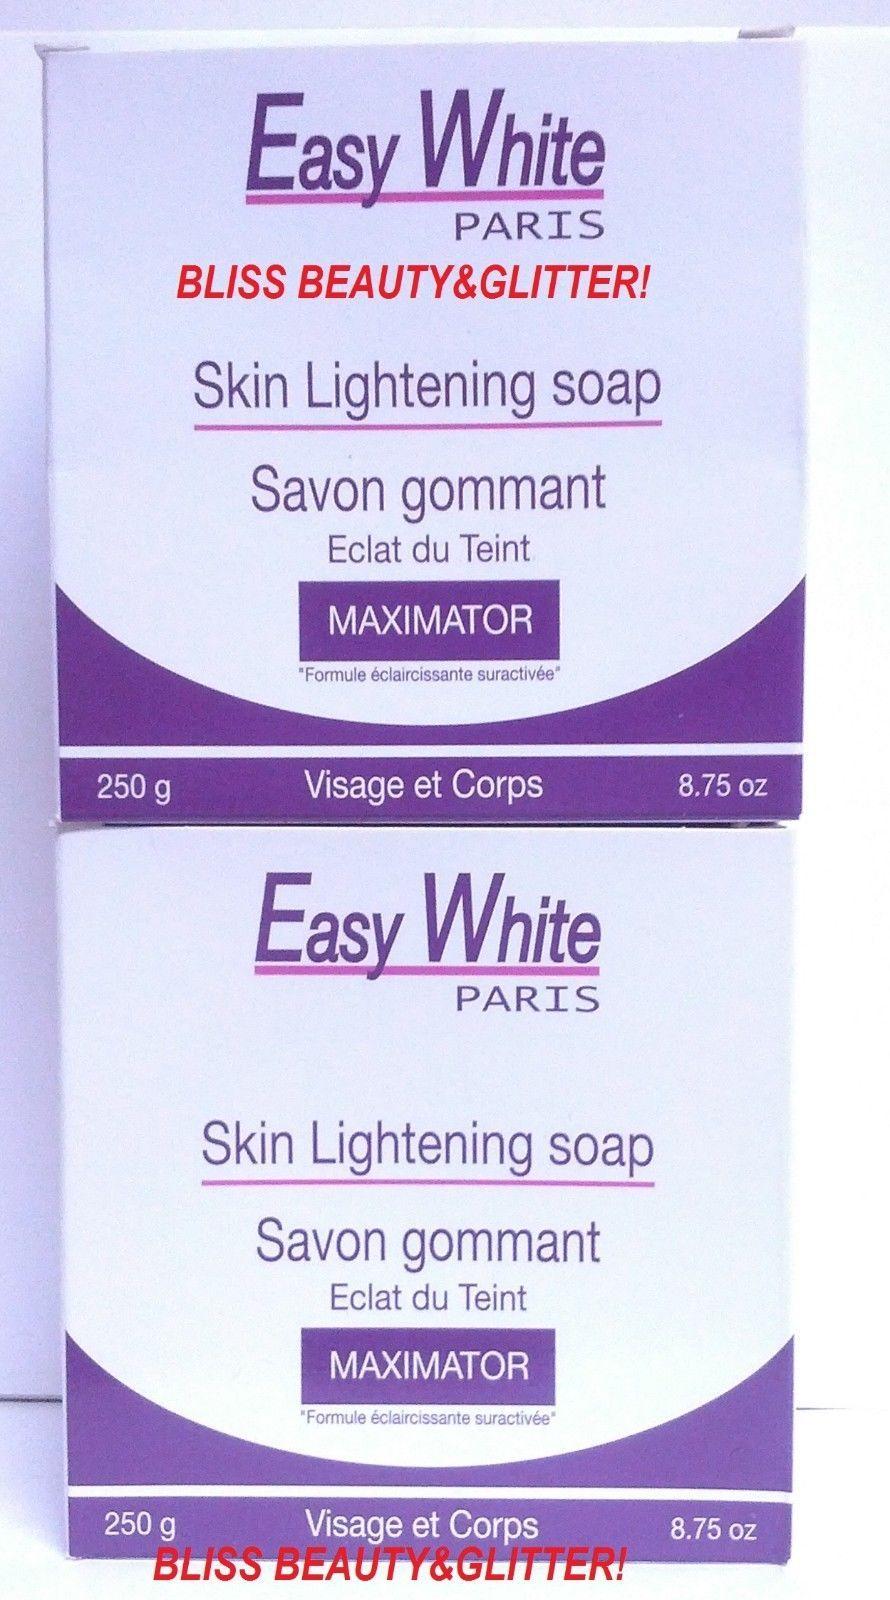 Easy White PARIS 2 LOT! Skin lightening MAXIMATOR Soap 250g HIGHLY ACCLAIMED!